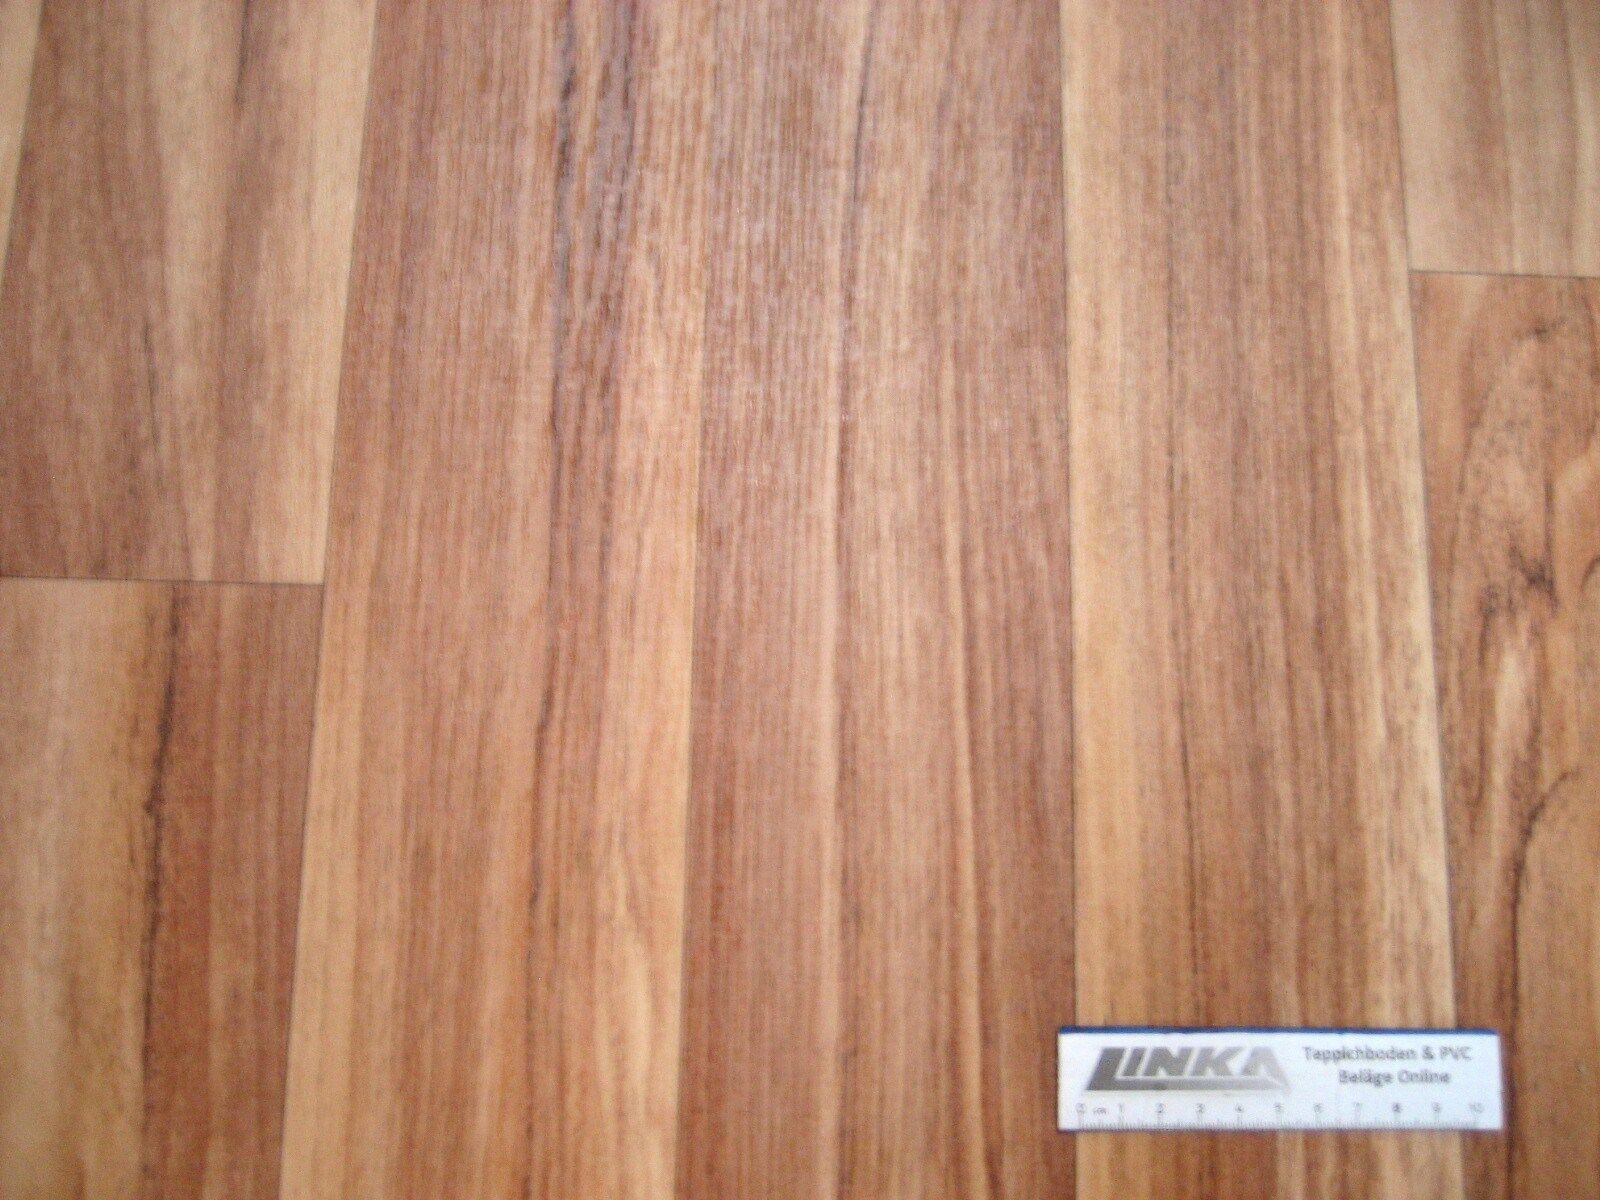 6343 PVC CV Belag Rest 540x99 Boden Bodenbelag Tropic robust günstig Walnuss